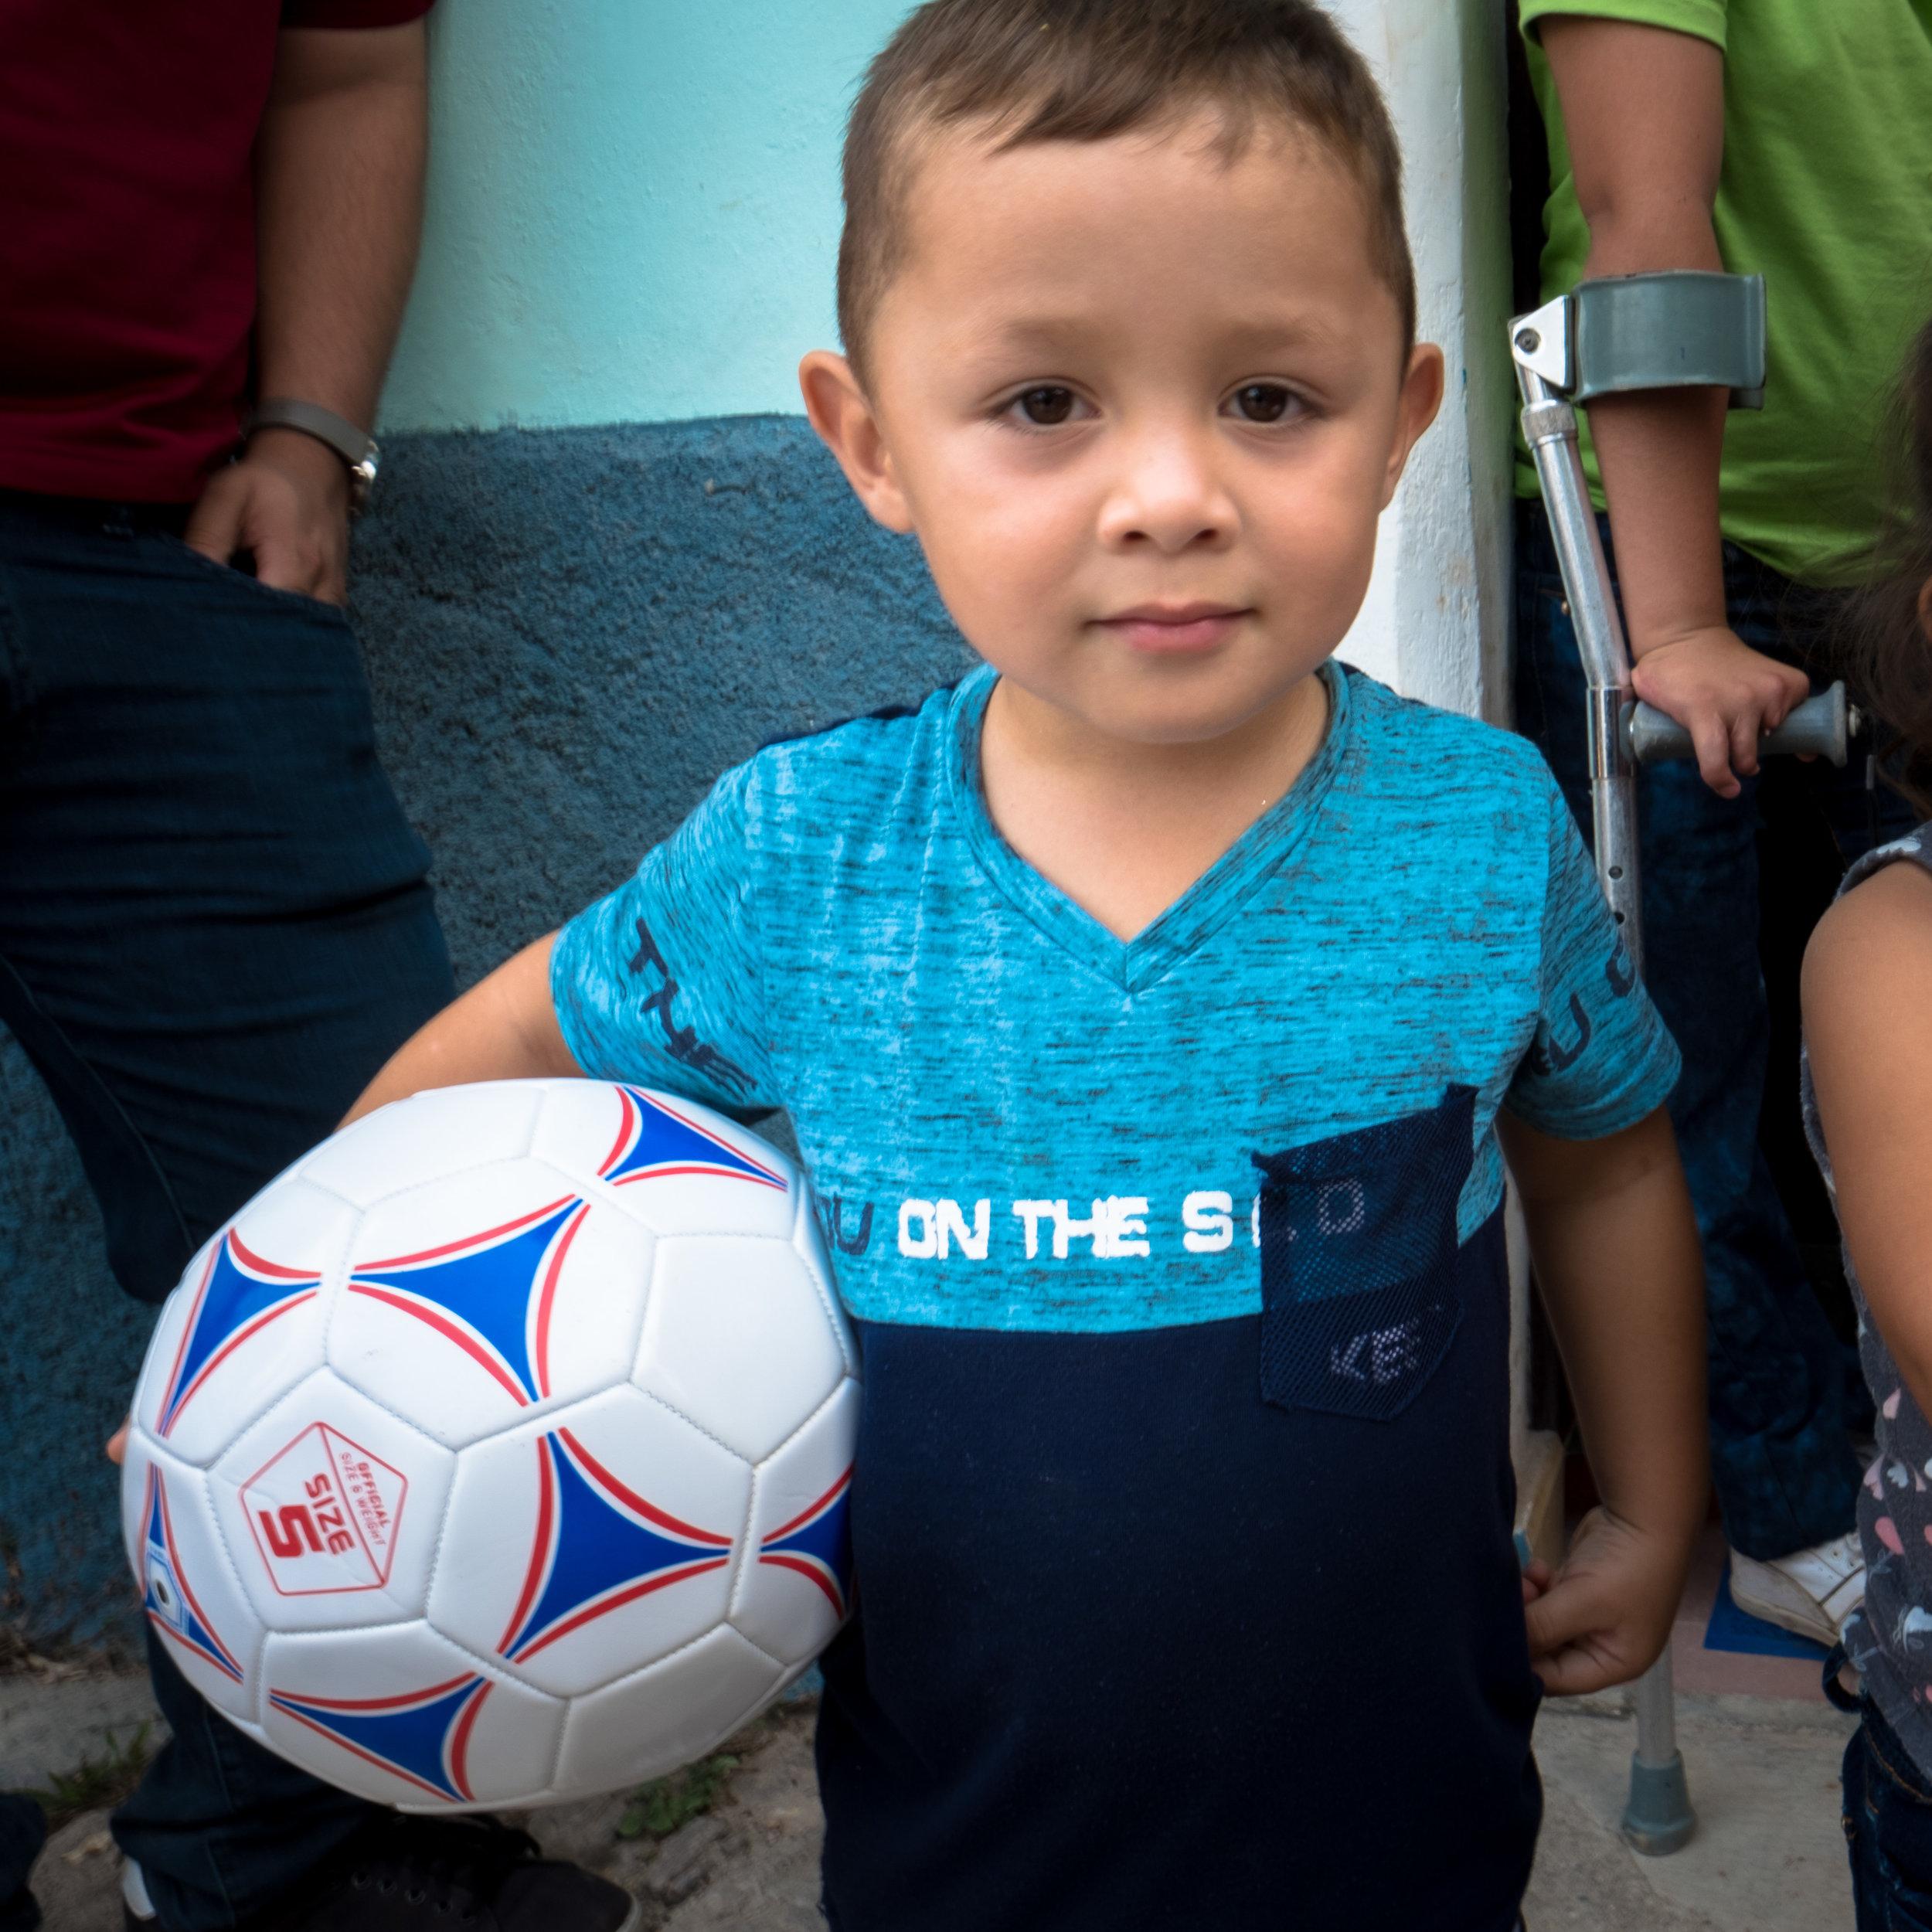 Honduras 18 day 2_lunch boy with ball.jpg